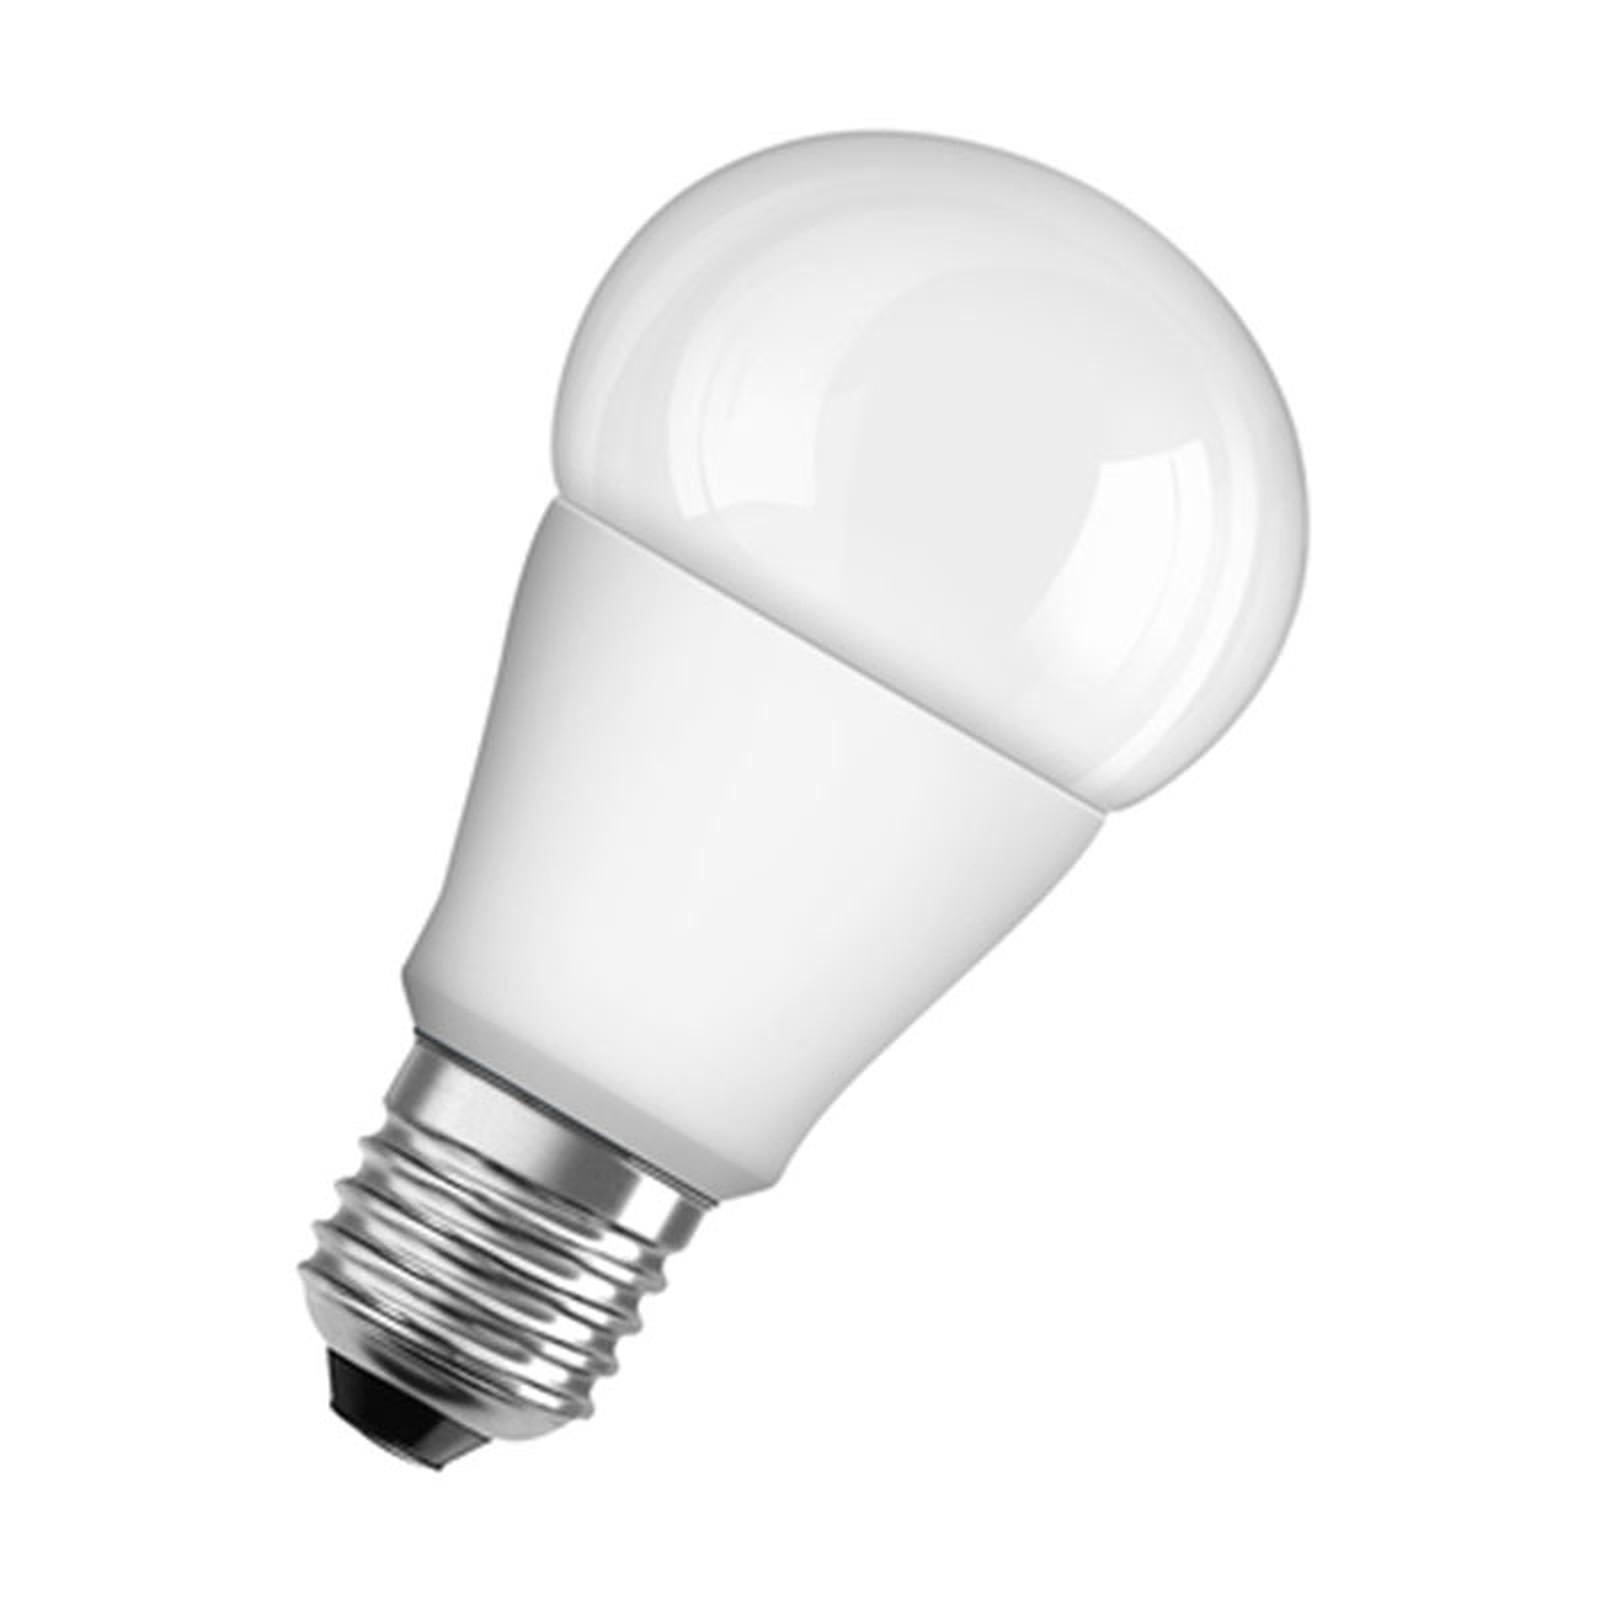 OSRAM Ampoule LED Star Classic standard E27 8W (60W) A+